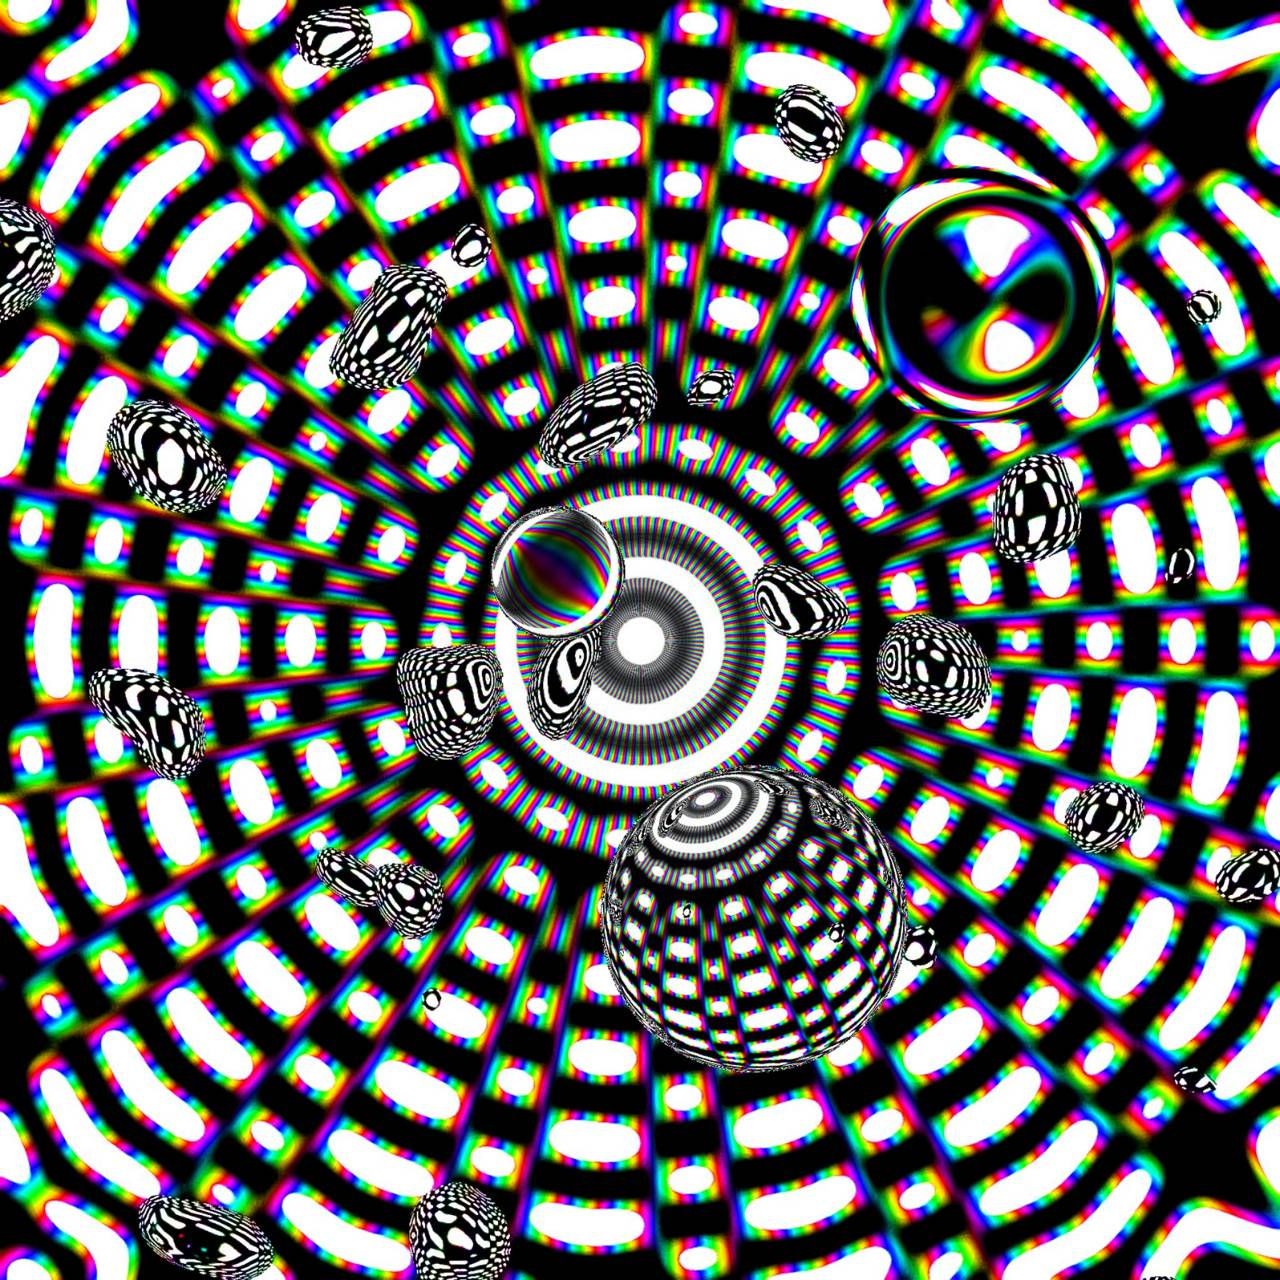 trippy hole